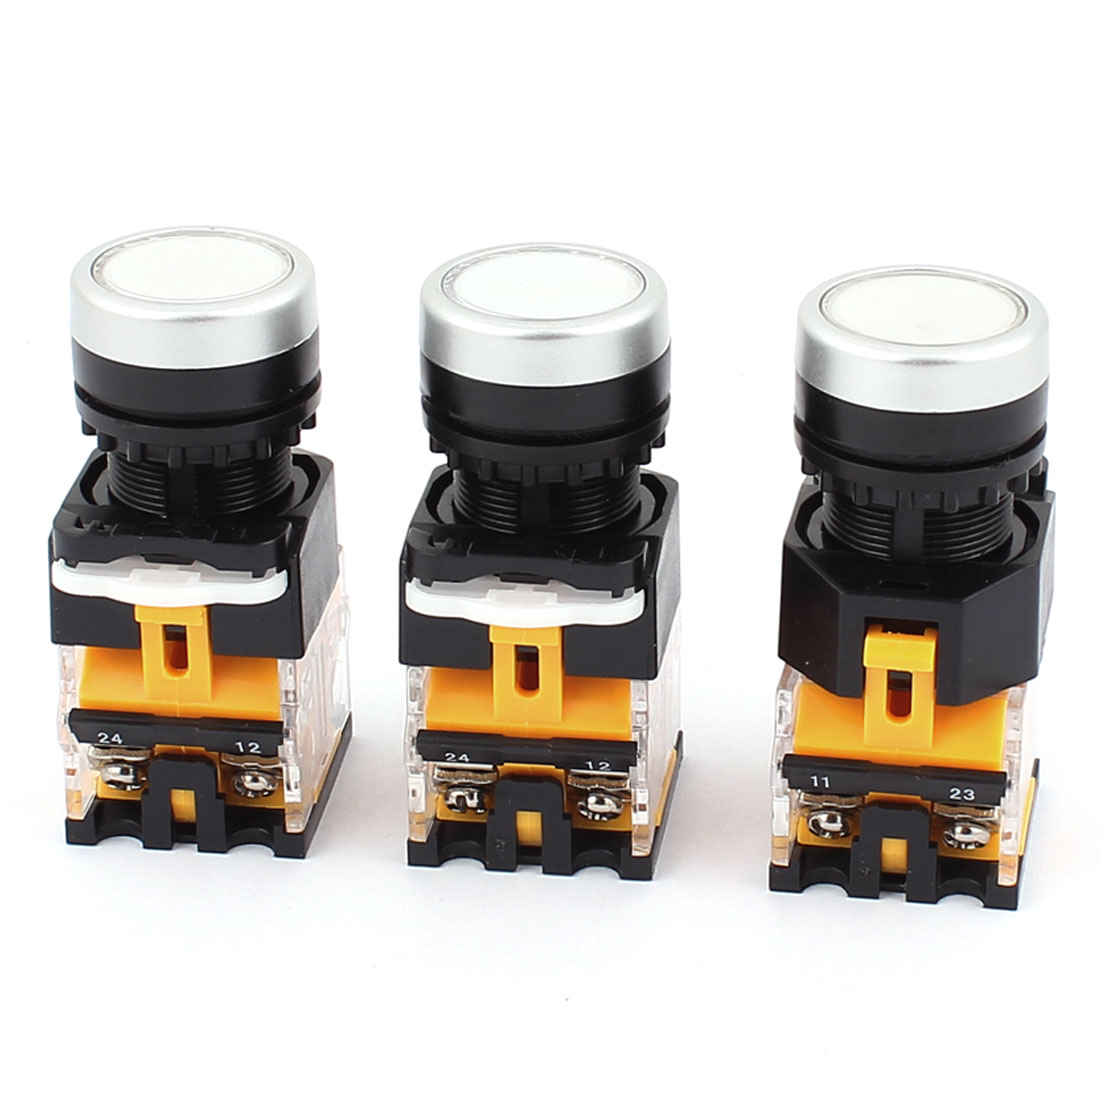 AC 660V 10A NO NC 4-Pin Momentary White Push Button Switch 3PCS